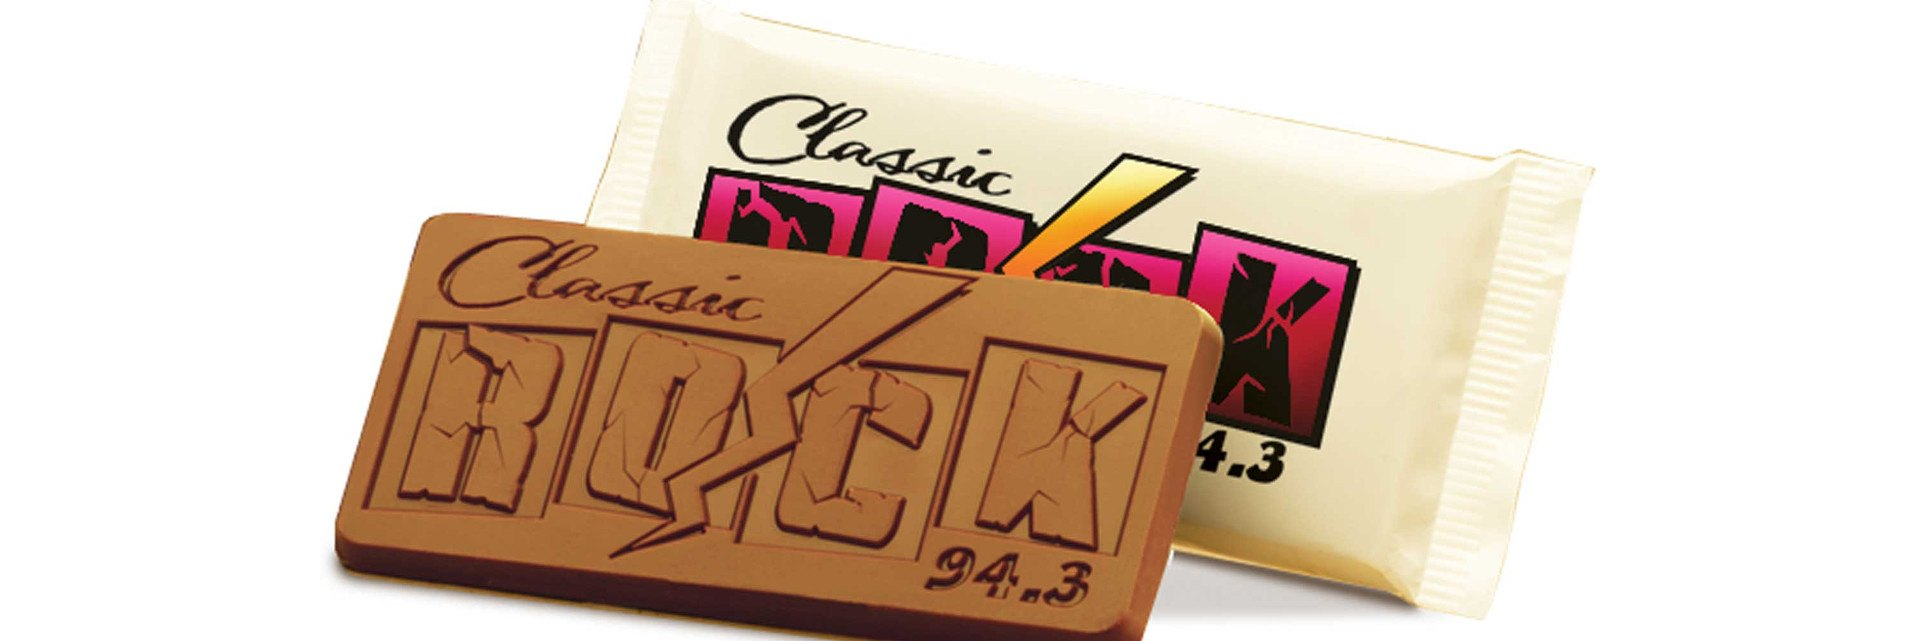 fundraising chocolate bar